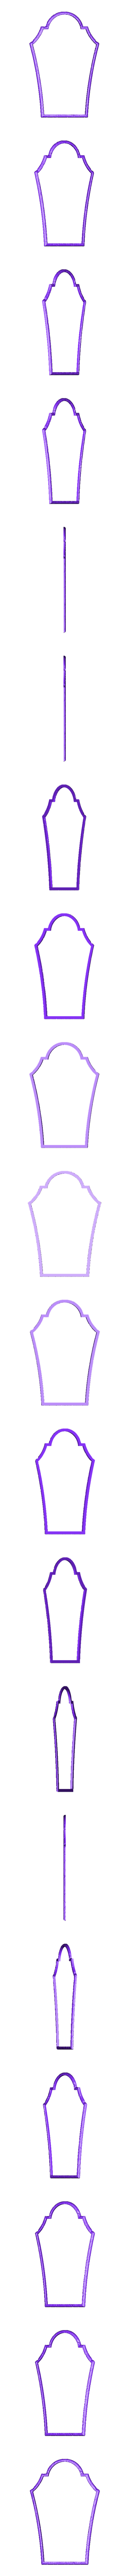 Front_Frame.stl Download free STL file HALLOWEEN Depth Silhouette Gravestone • Model to 3D print, Grafit